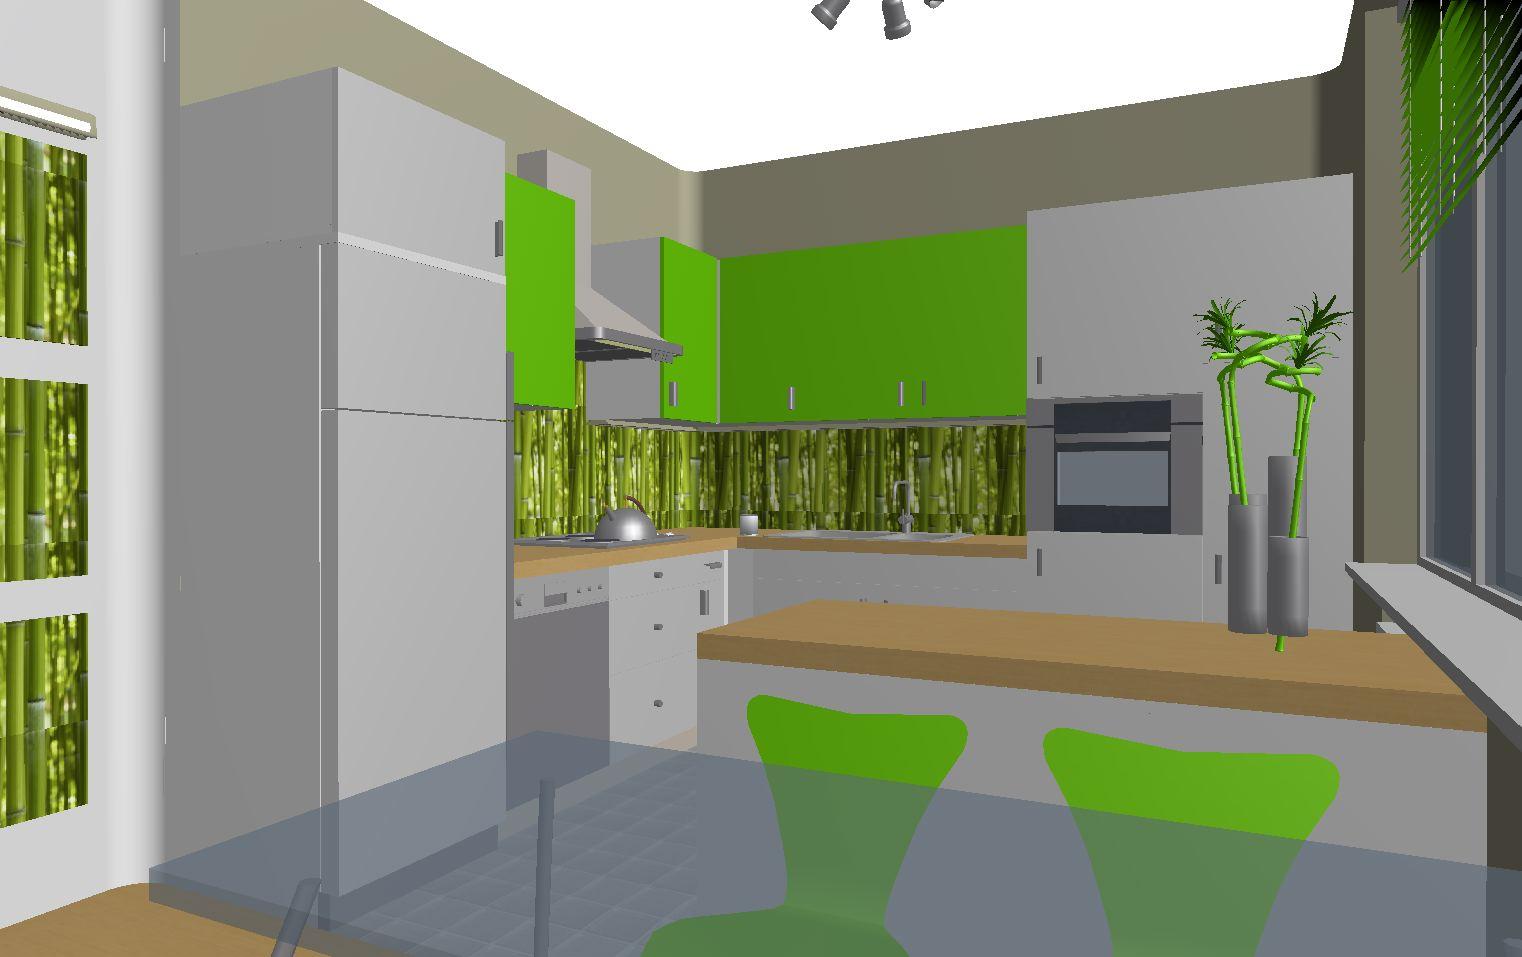 Architekt Pabianice OOO studio Architektura i Design portfolio projekt wnętrza kuchnia 3